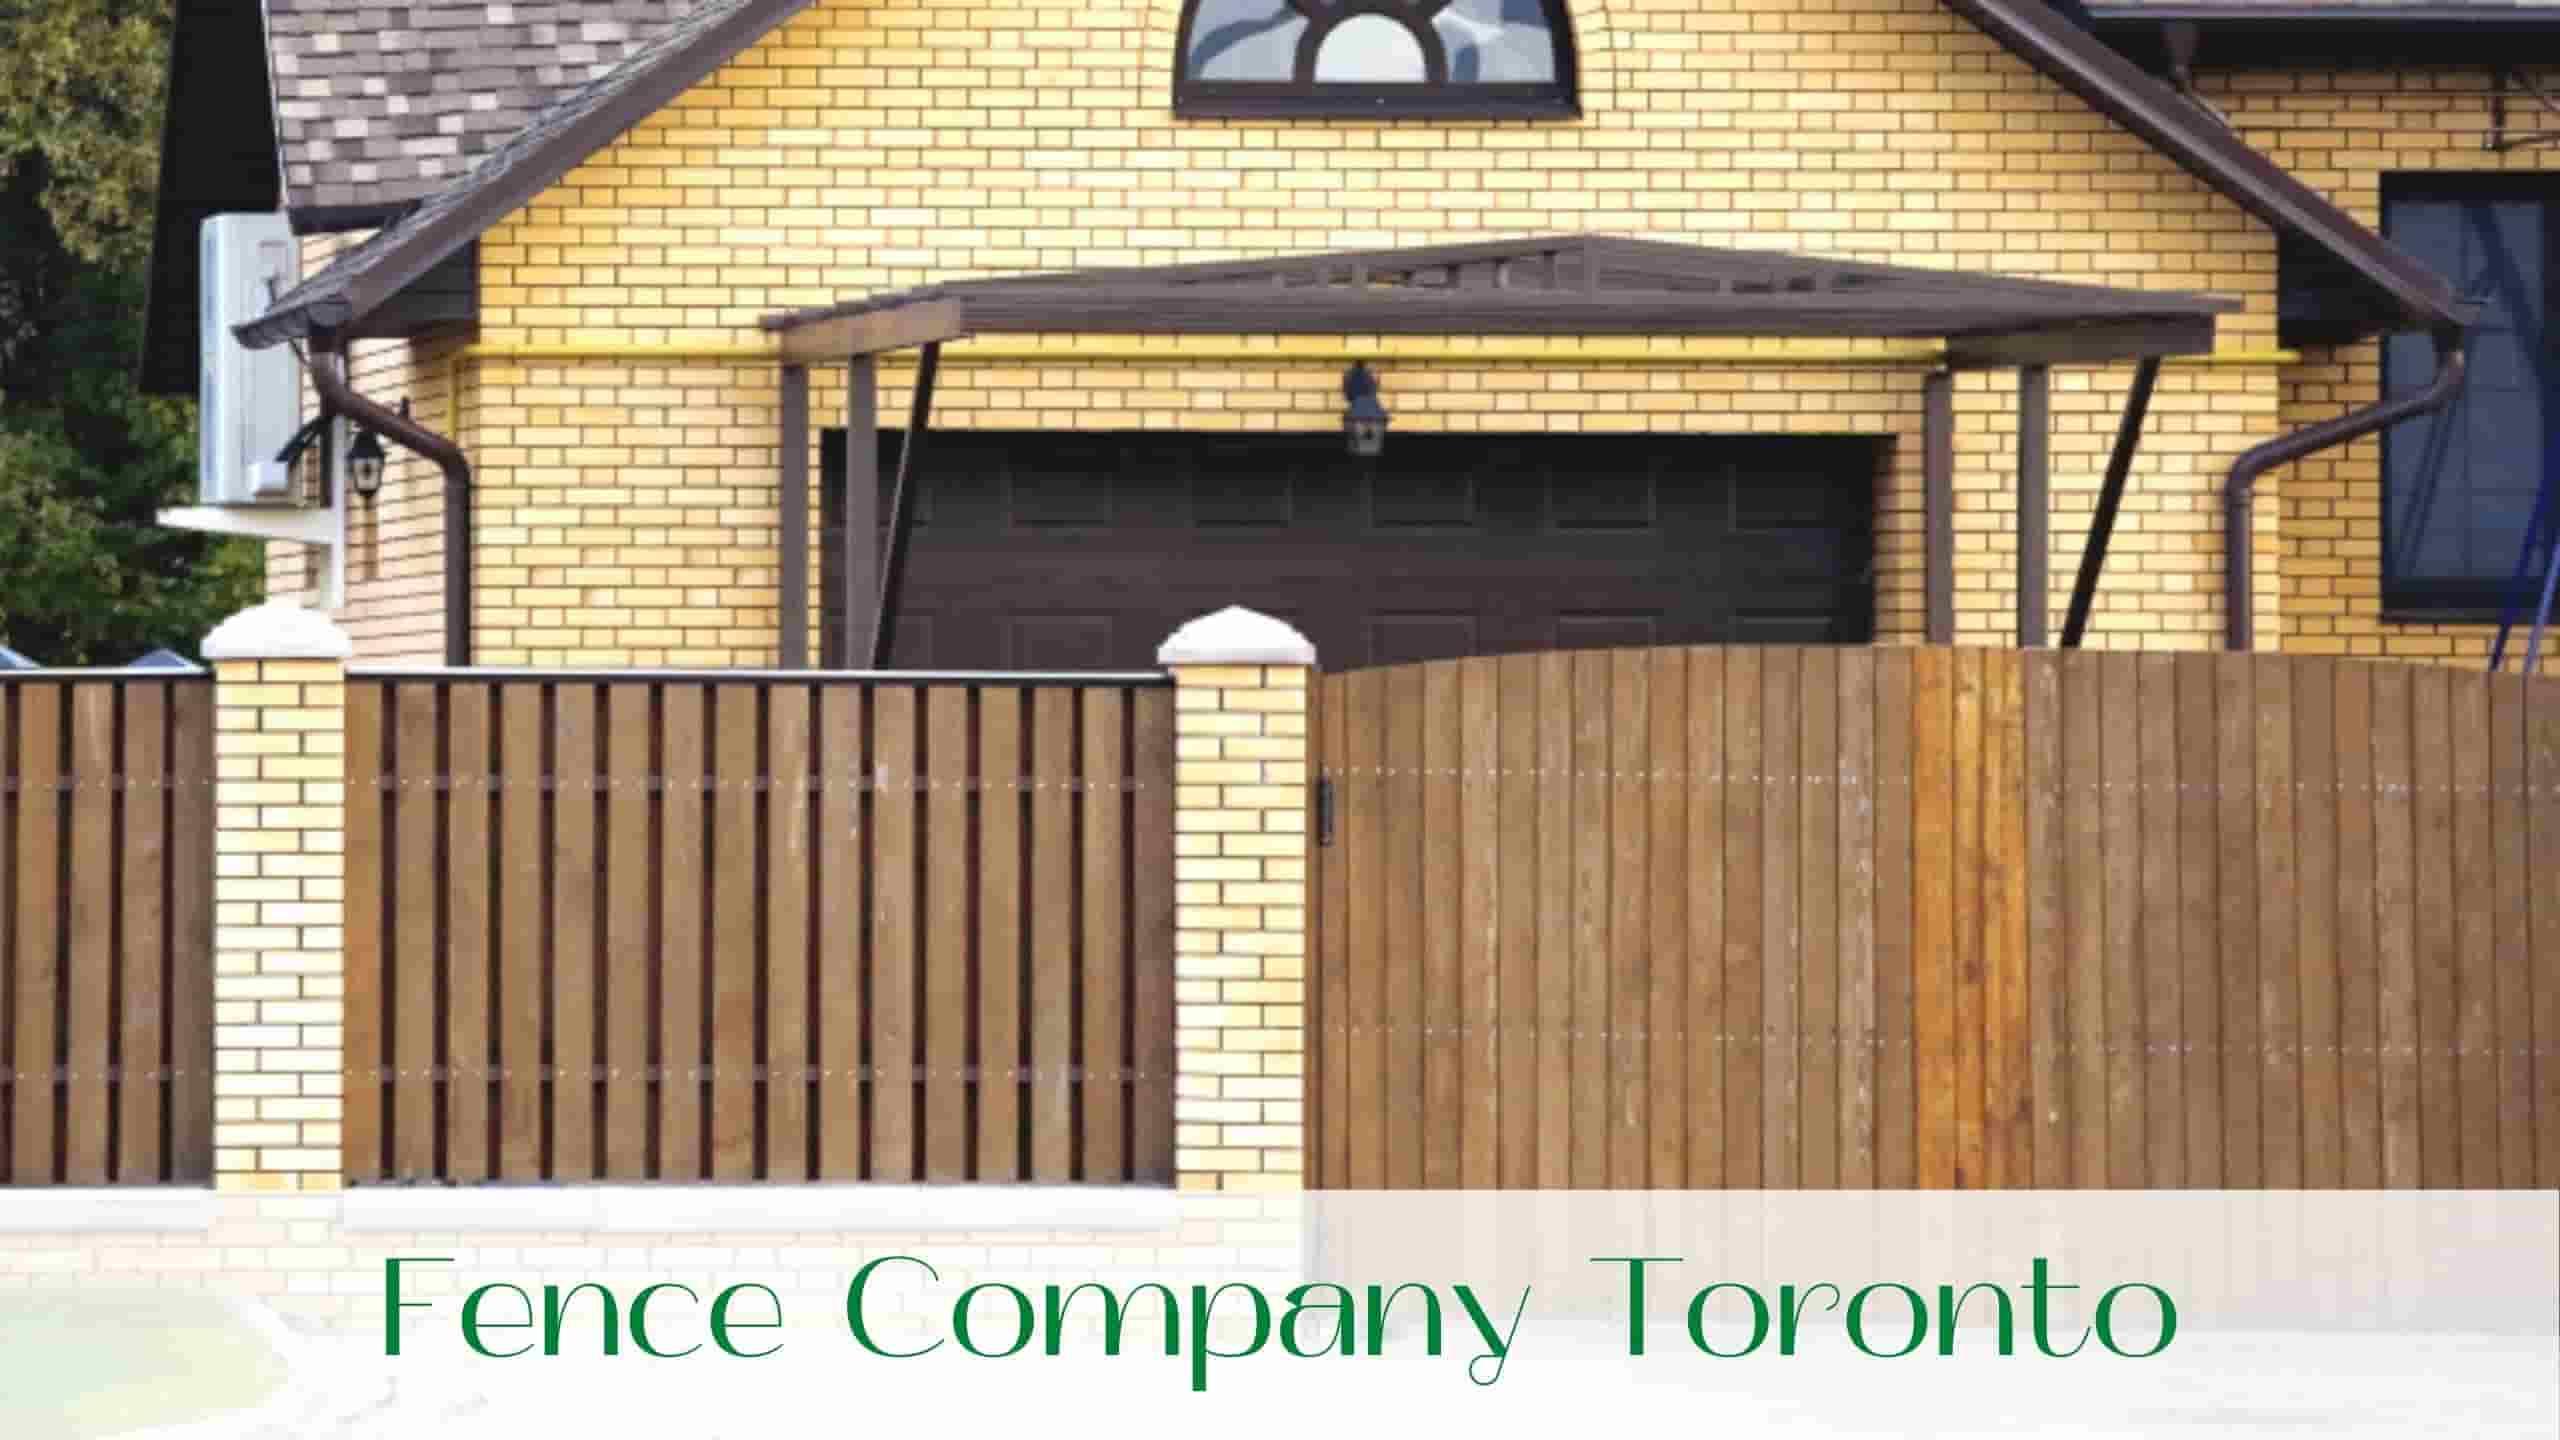 image-fance-company-toronto